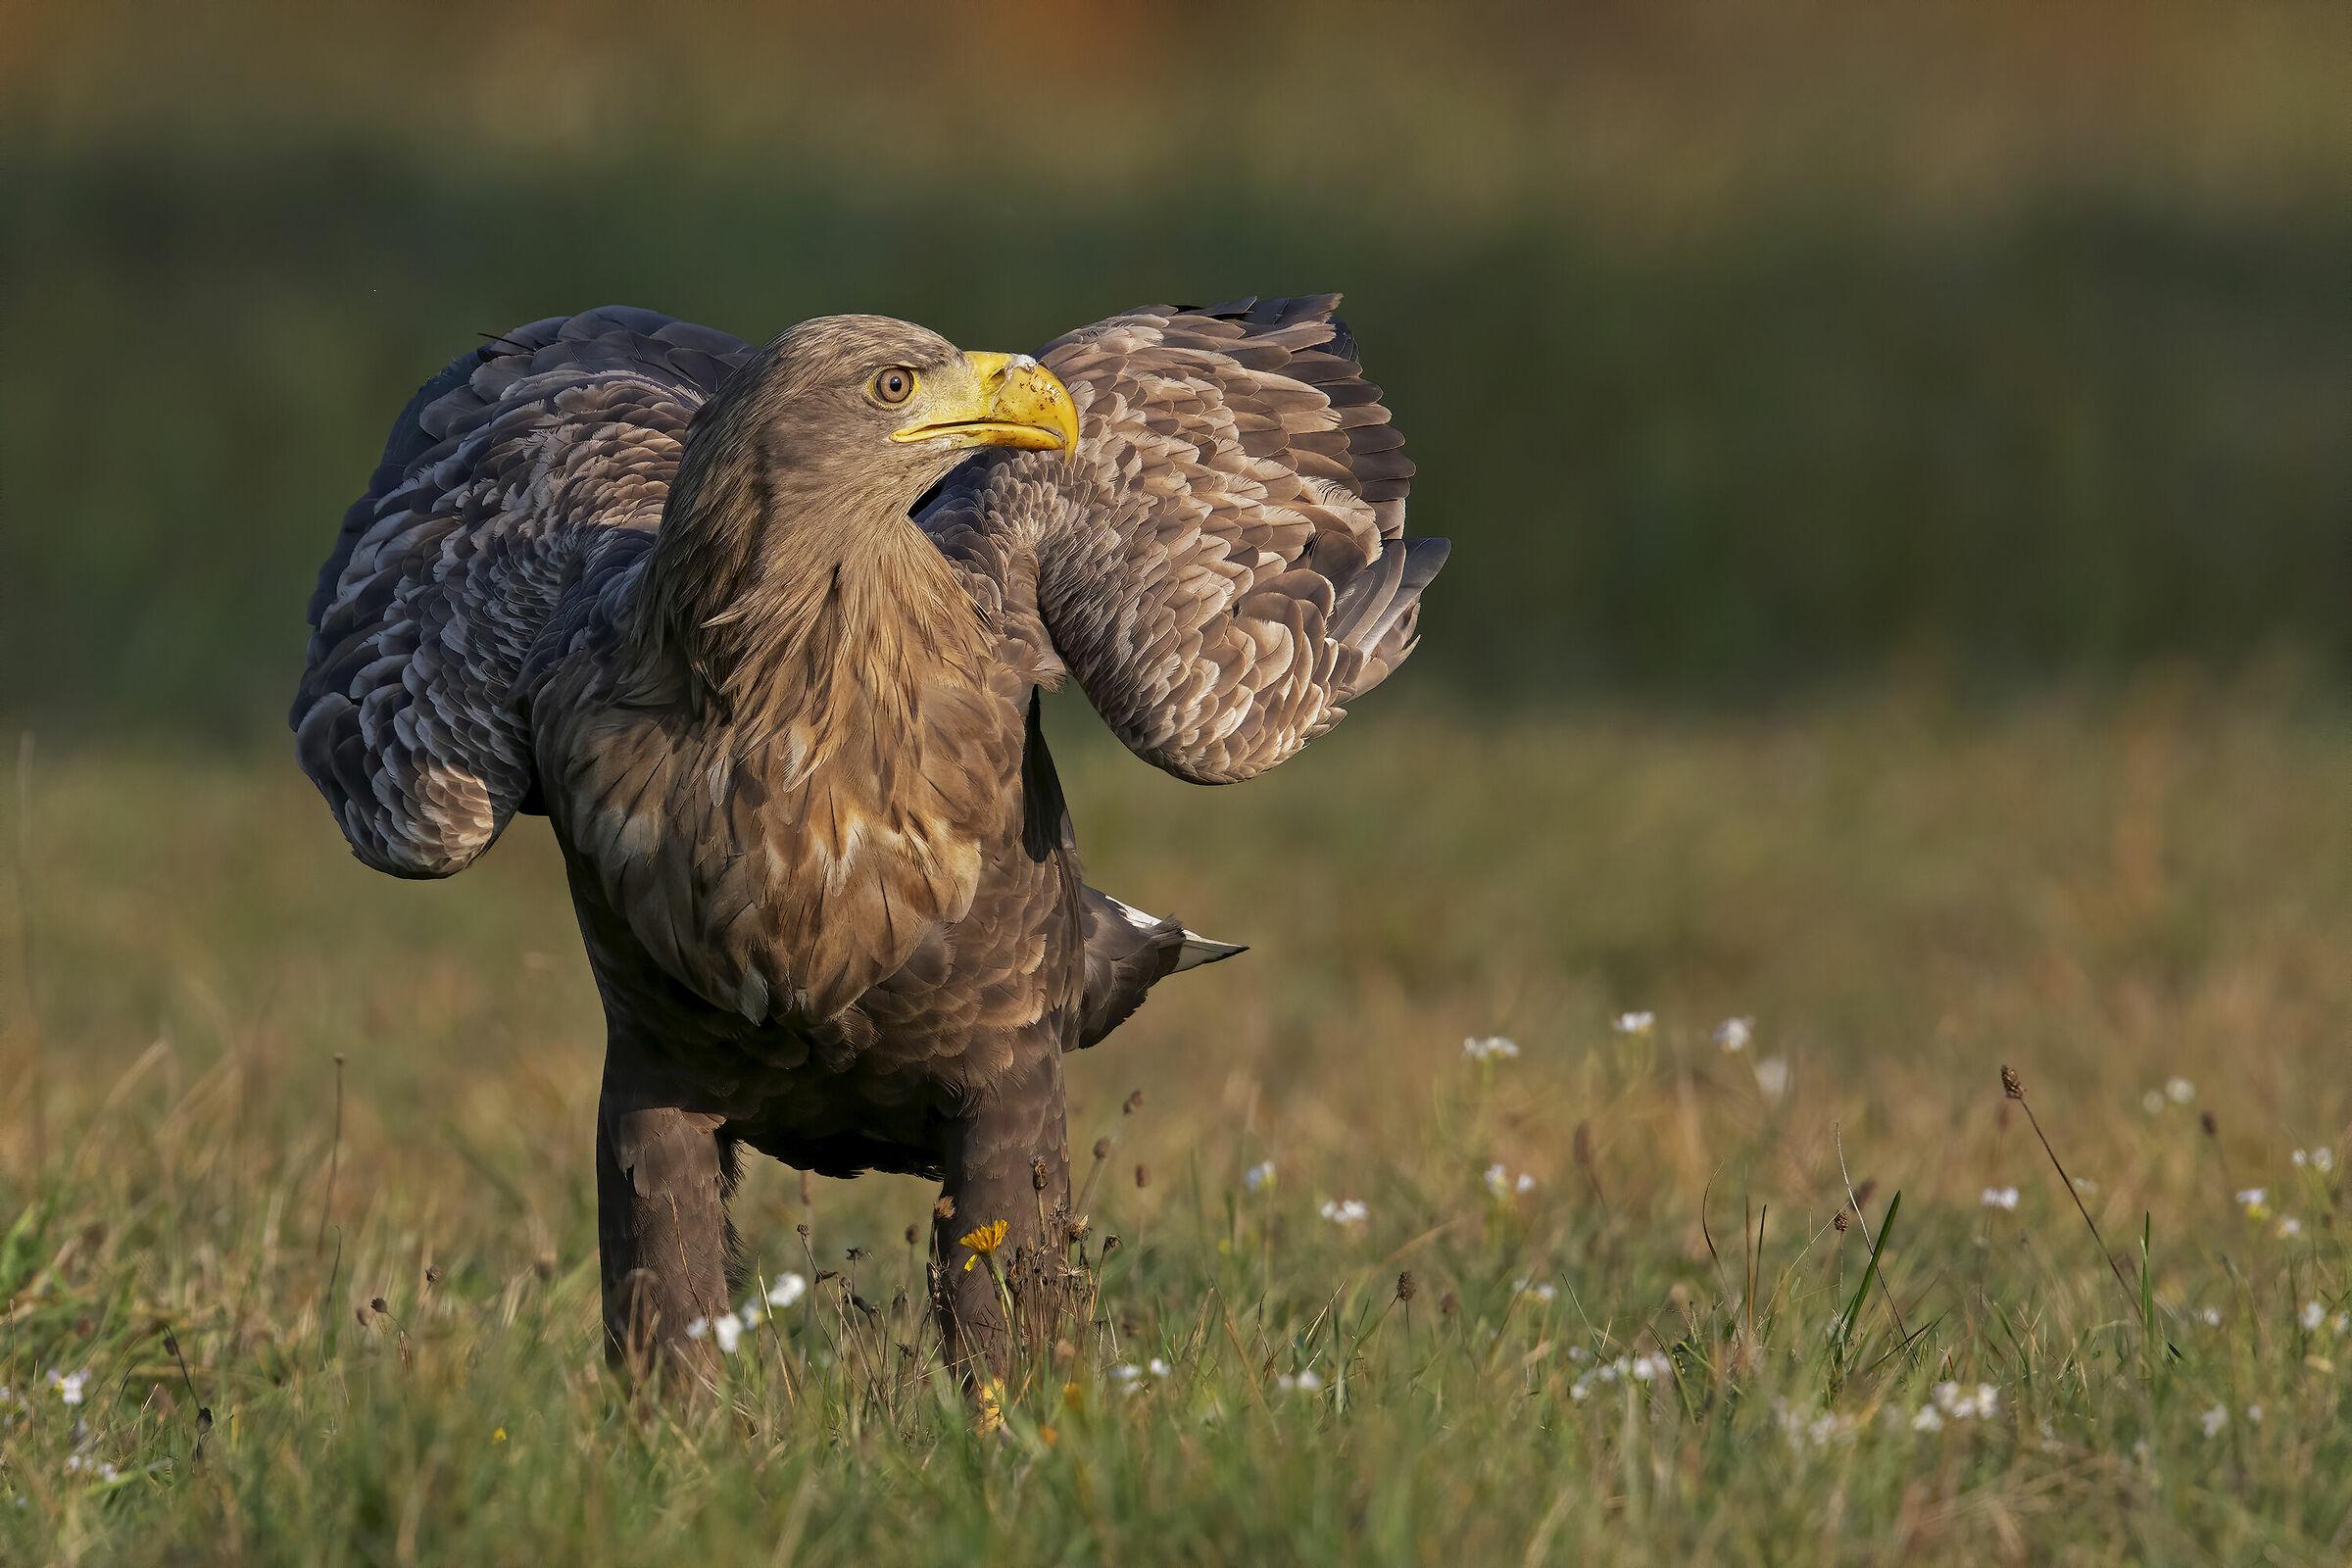 The Look of the Sea Eagle...